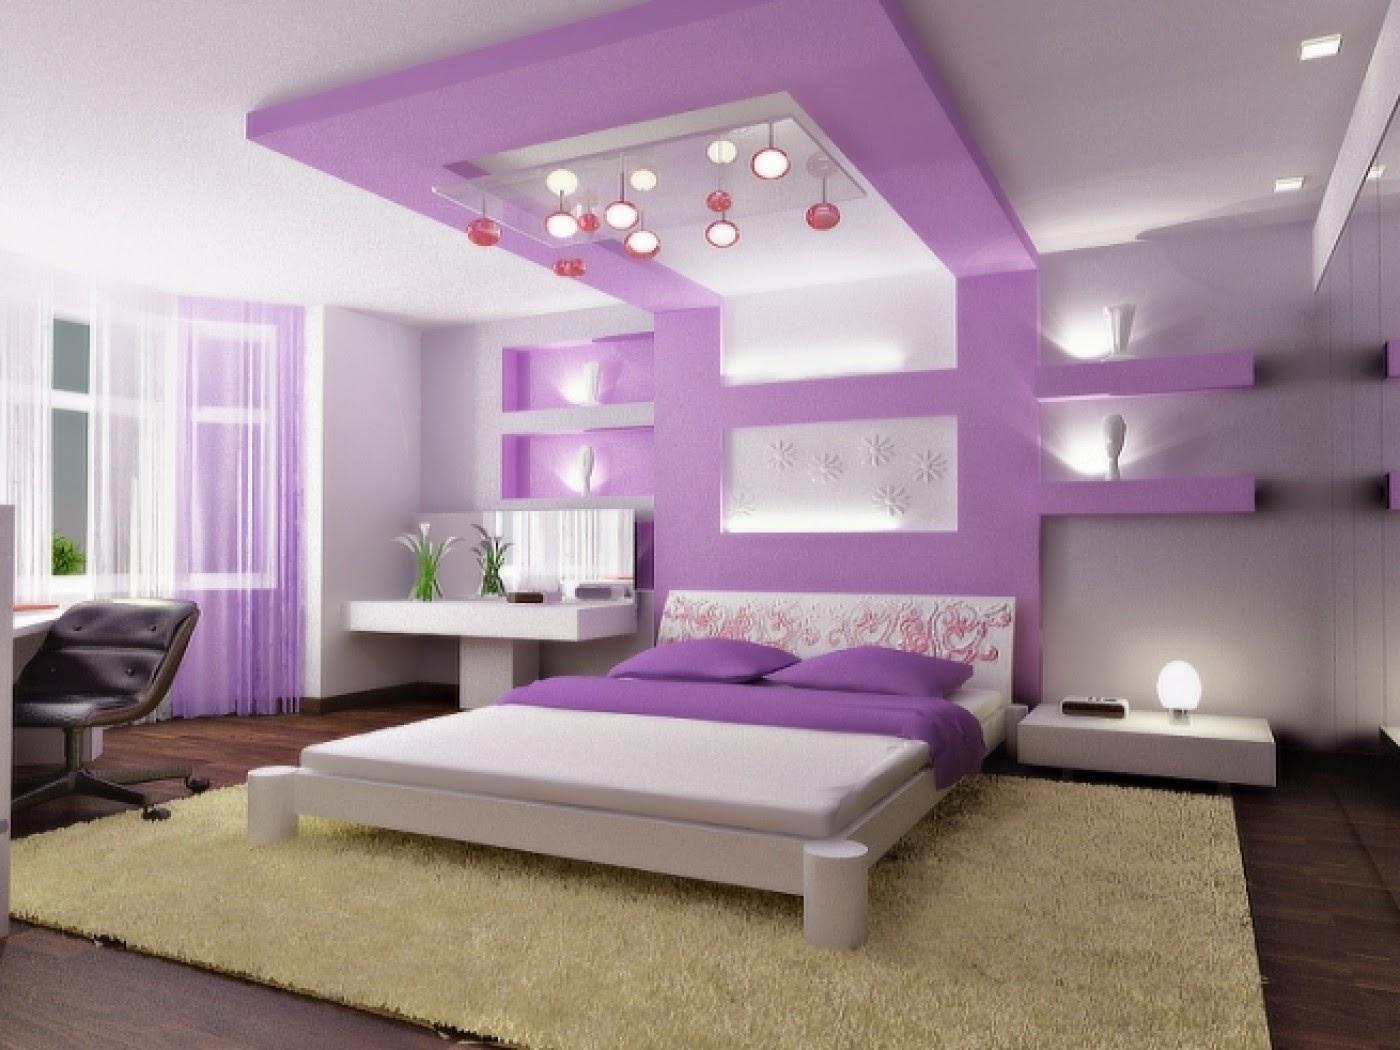 ديكور جبس بورد غرف نوم 2020 7